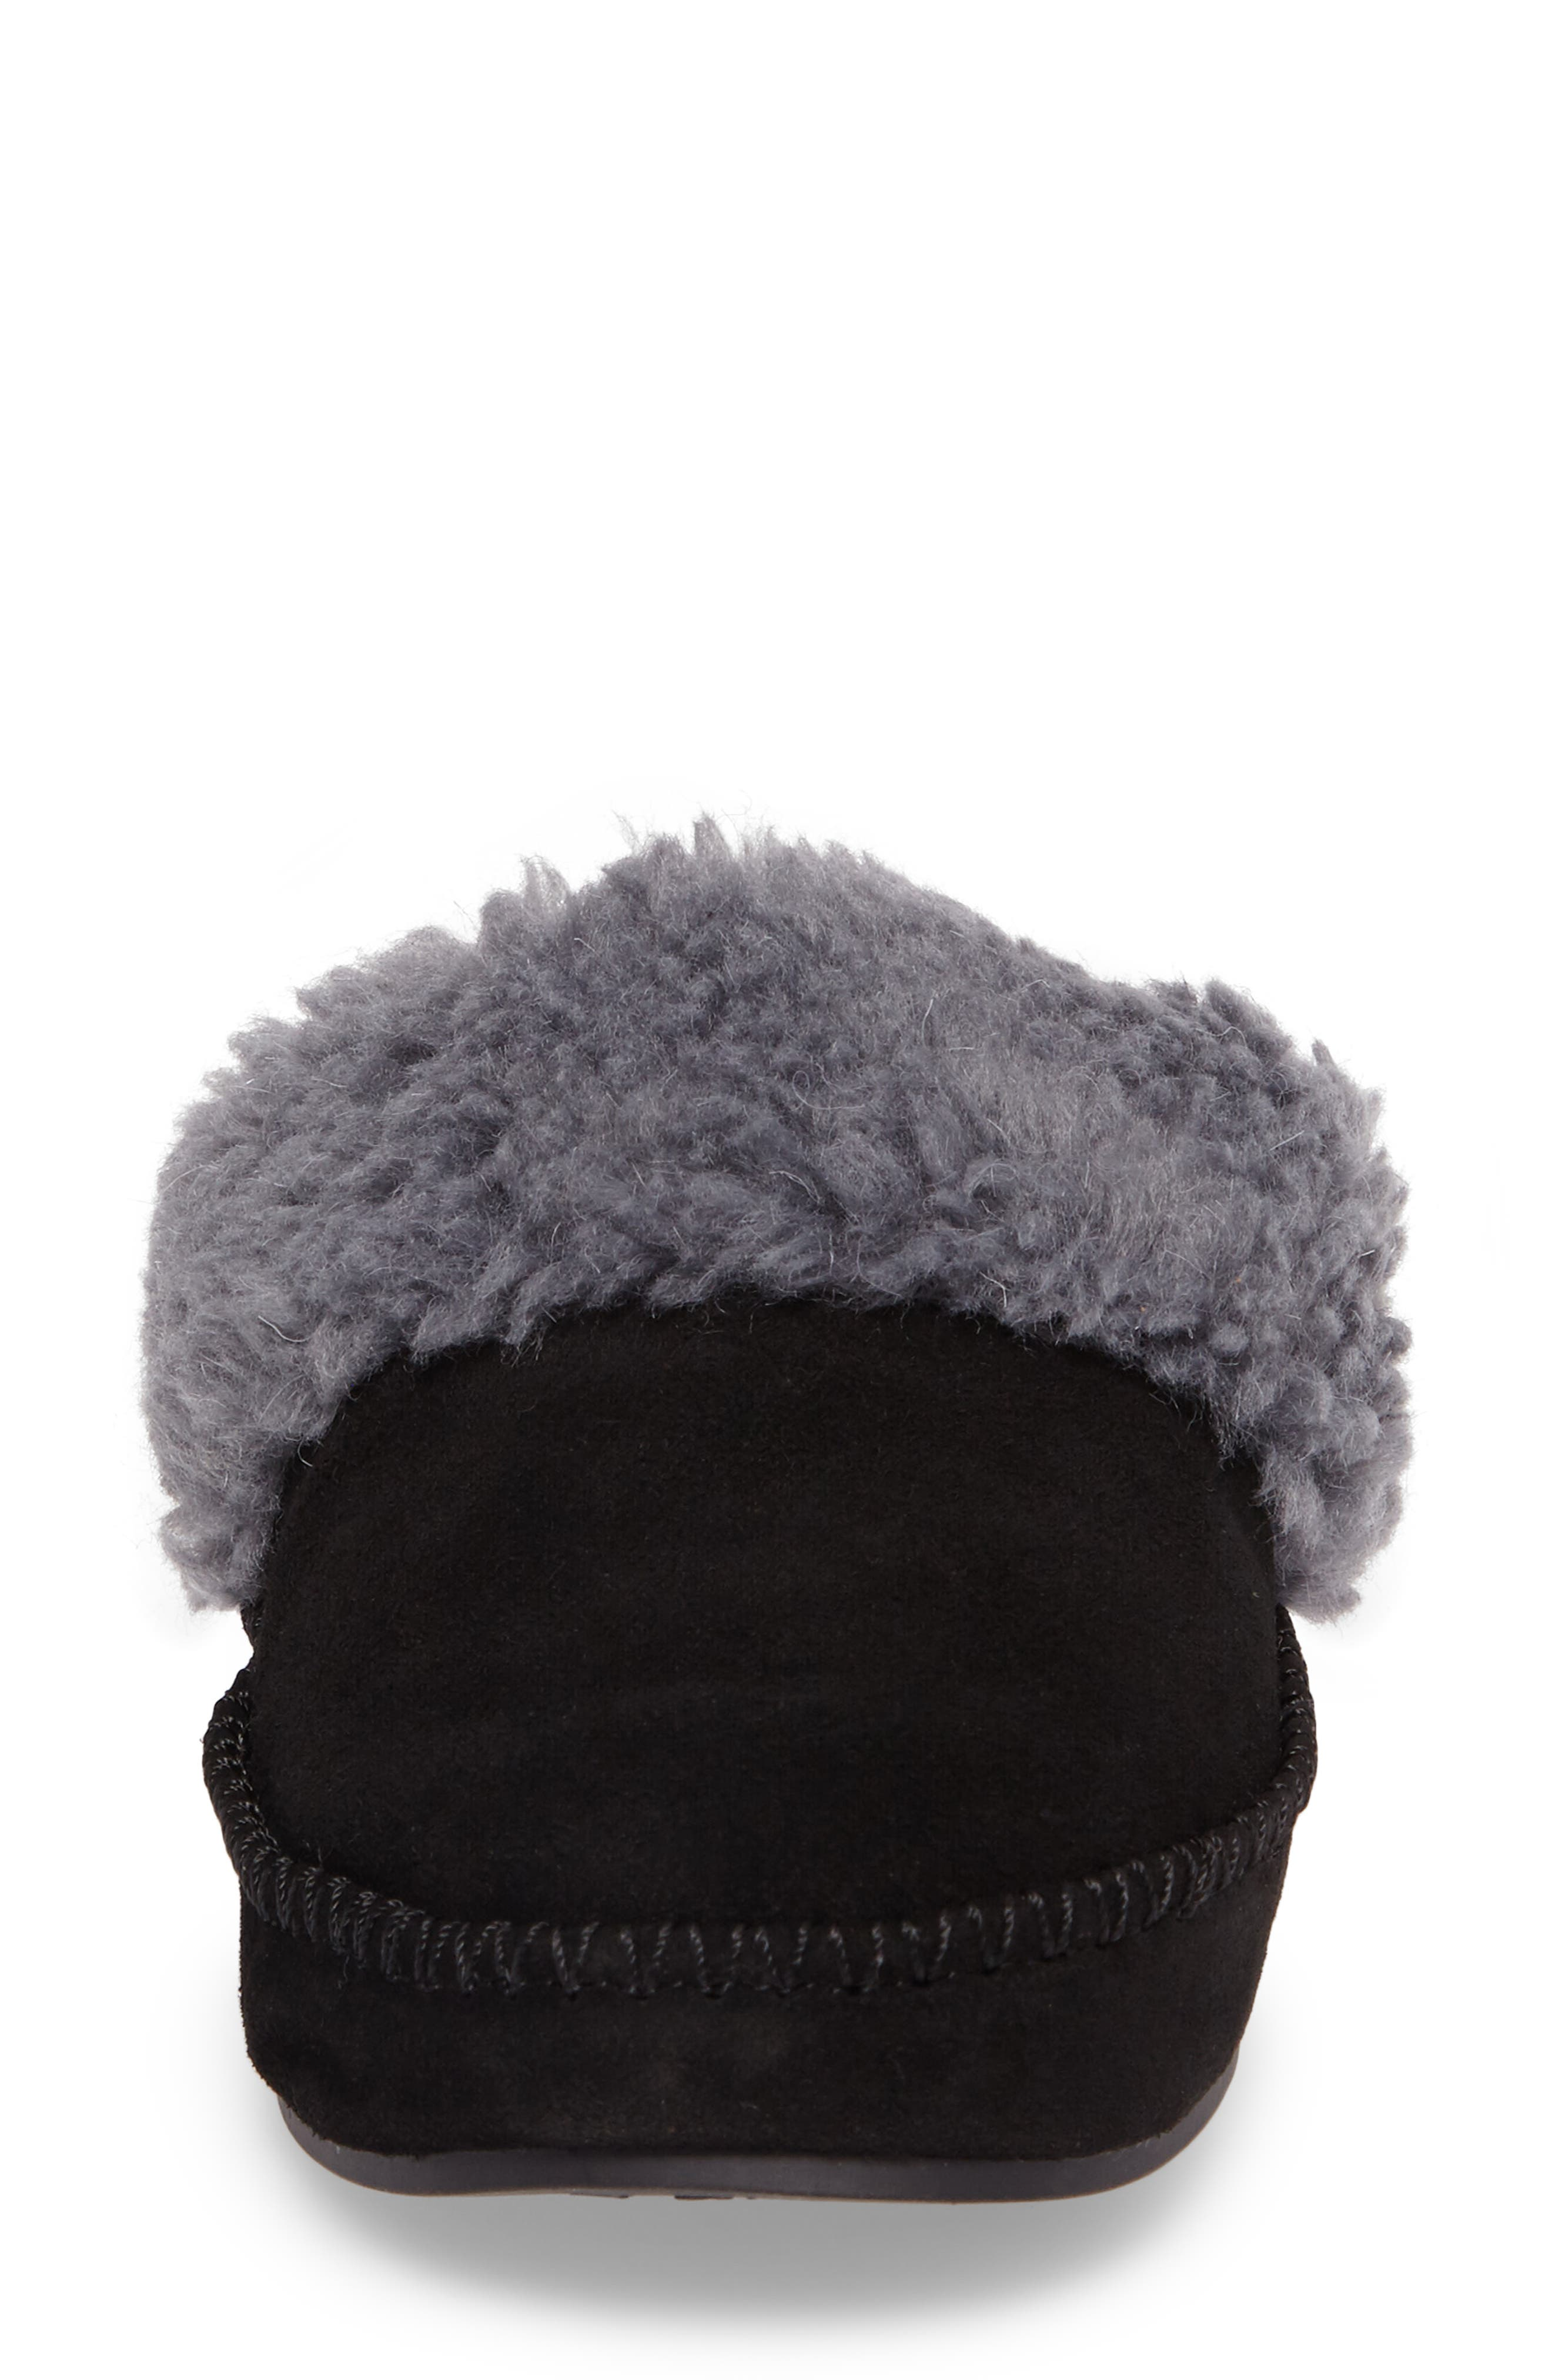 VIONIC,                             Marley Faux Fur Slipper,                             Alternate thumbnail 4, color,                             BLACK SUEDE